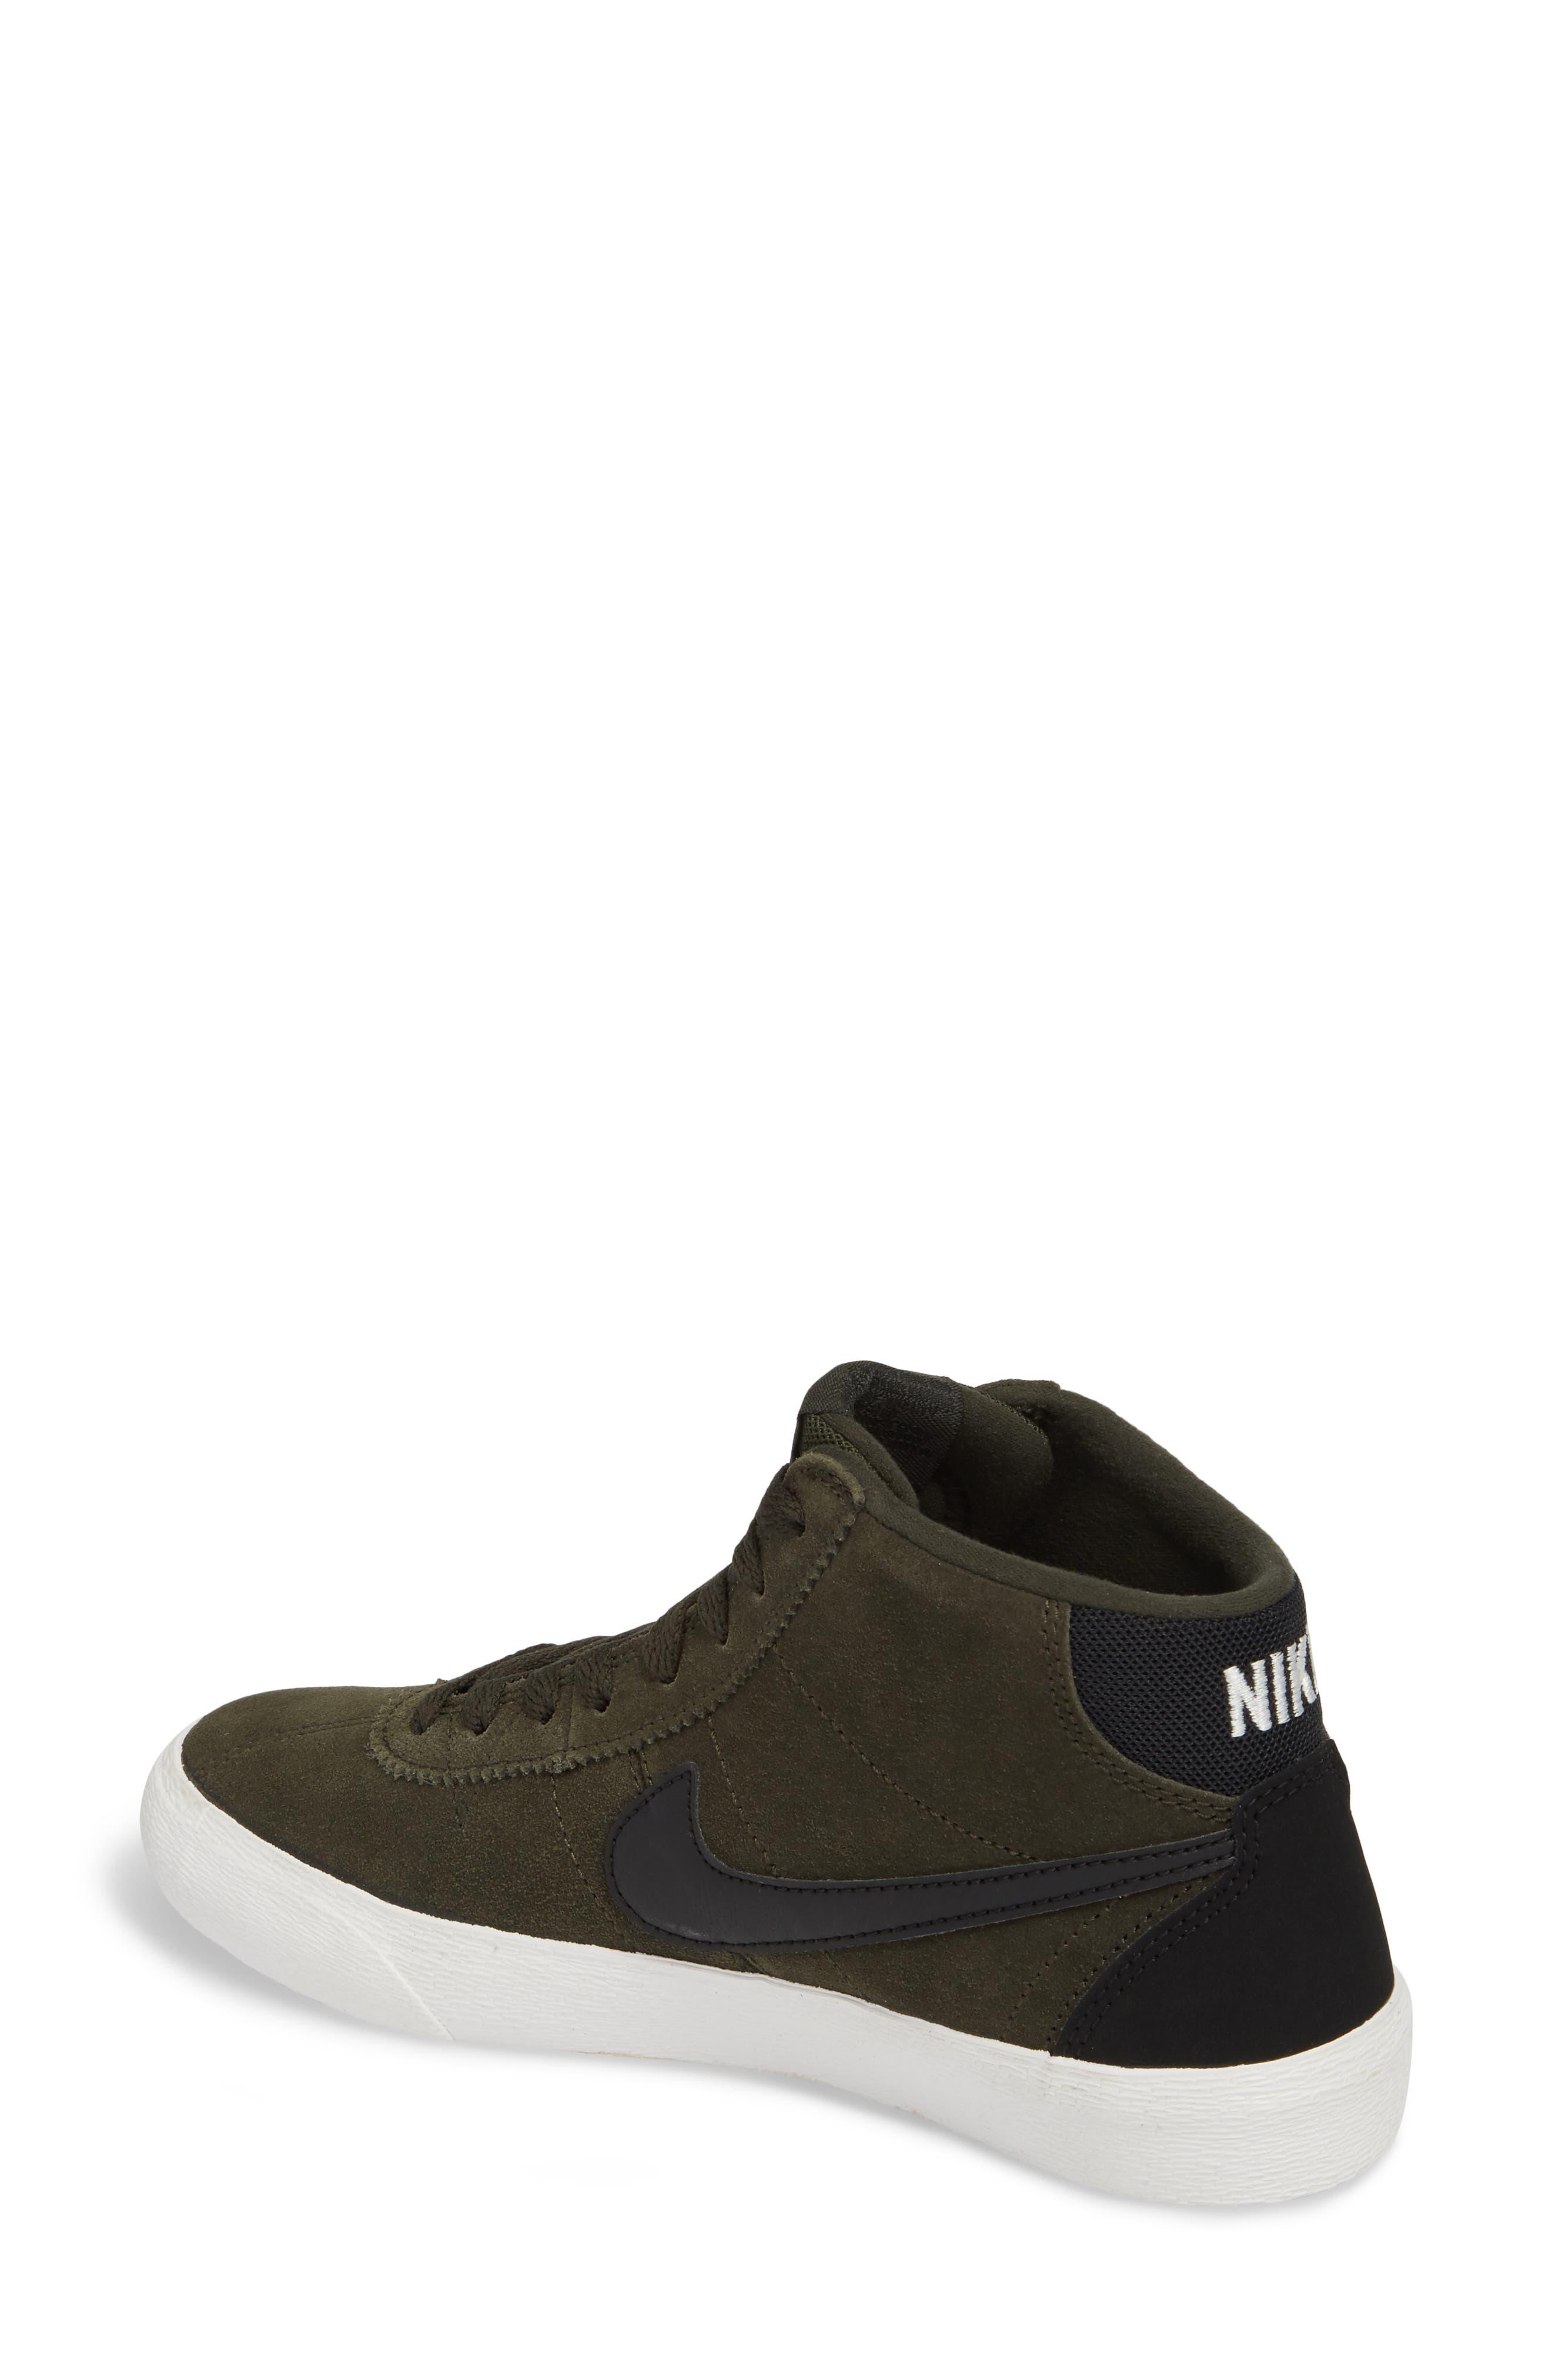 SB Bruin Hi Skateboarding Sneaker,                             Alternate thumbnail 2, color,                             Sequoia/ Black/ Summit White